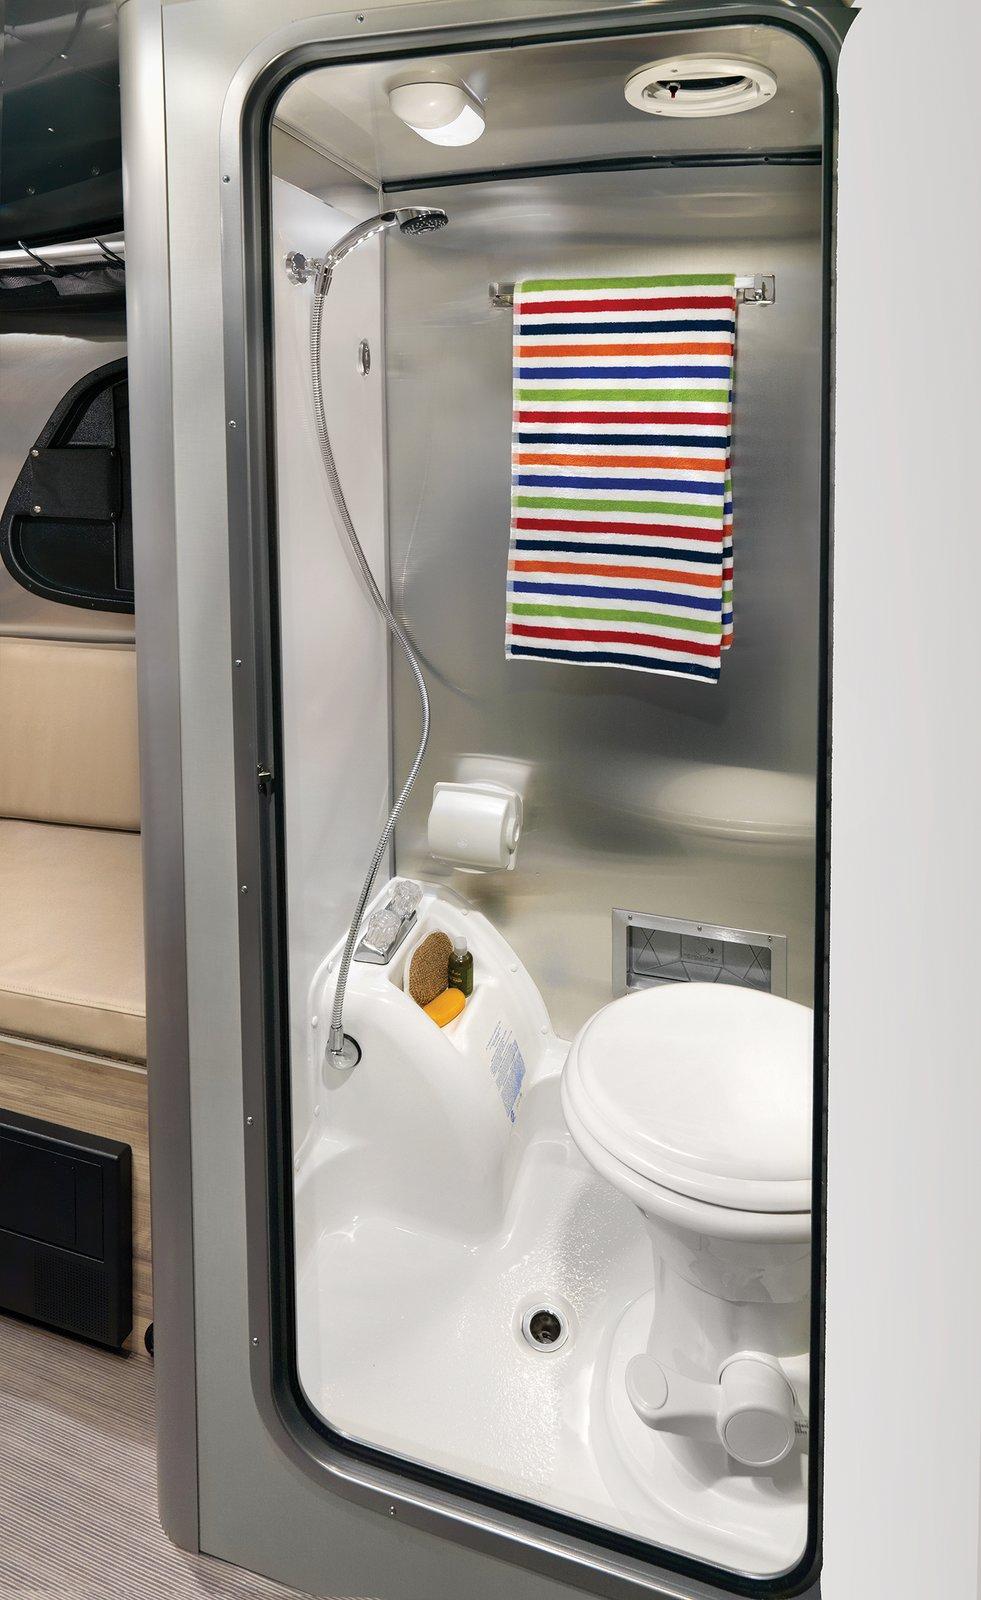 basecamp airstream adventure trailer bathroom shower